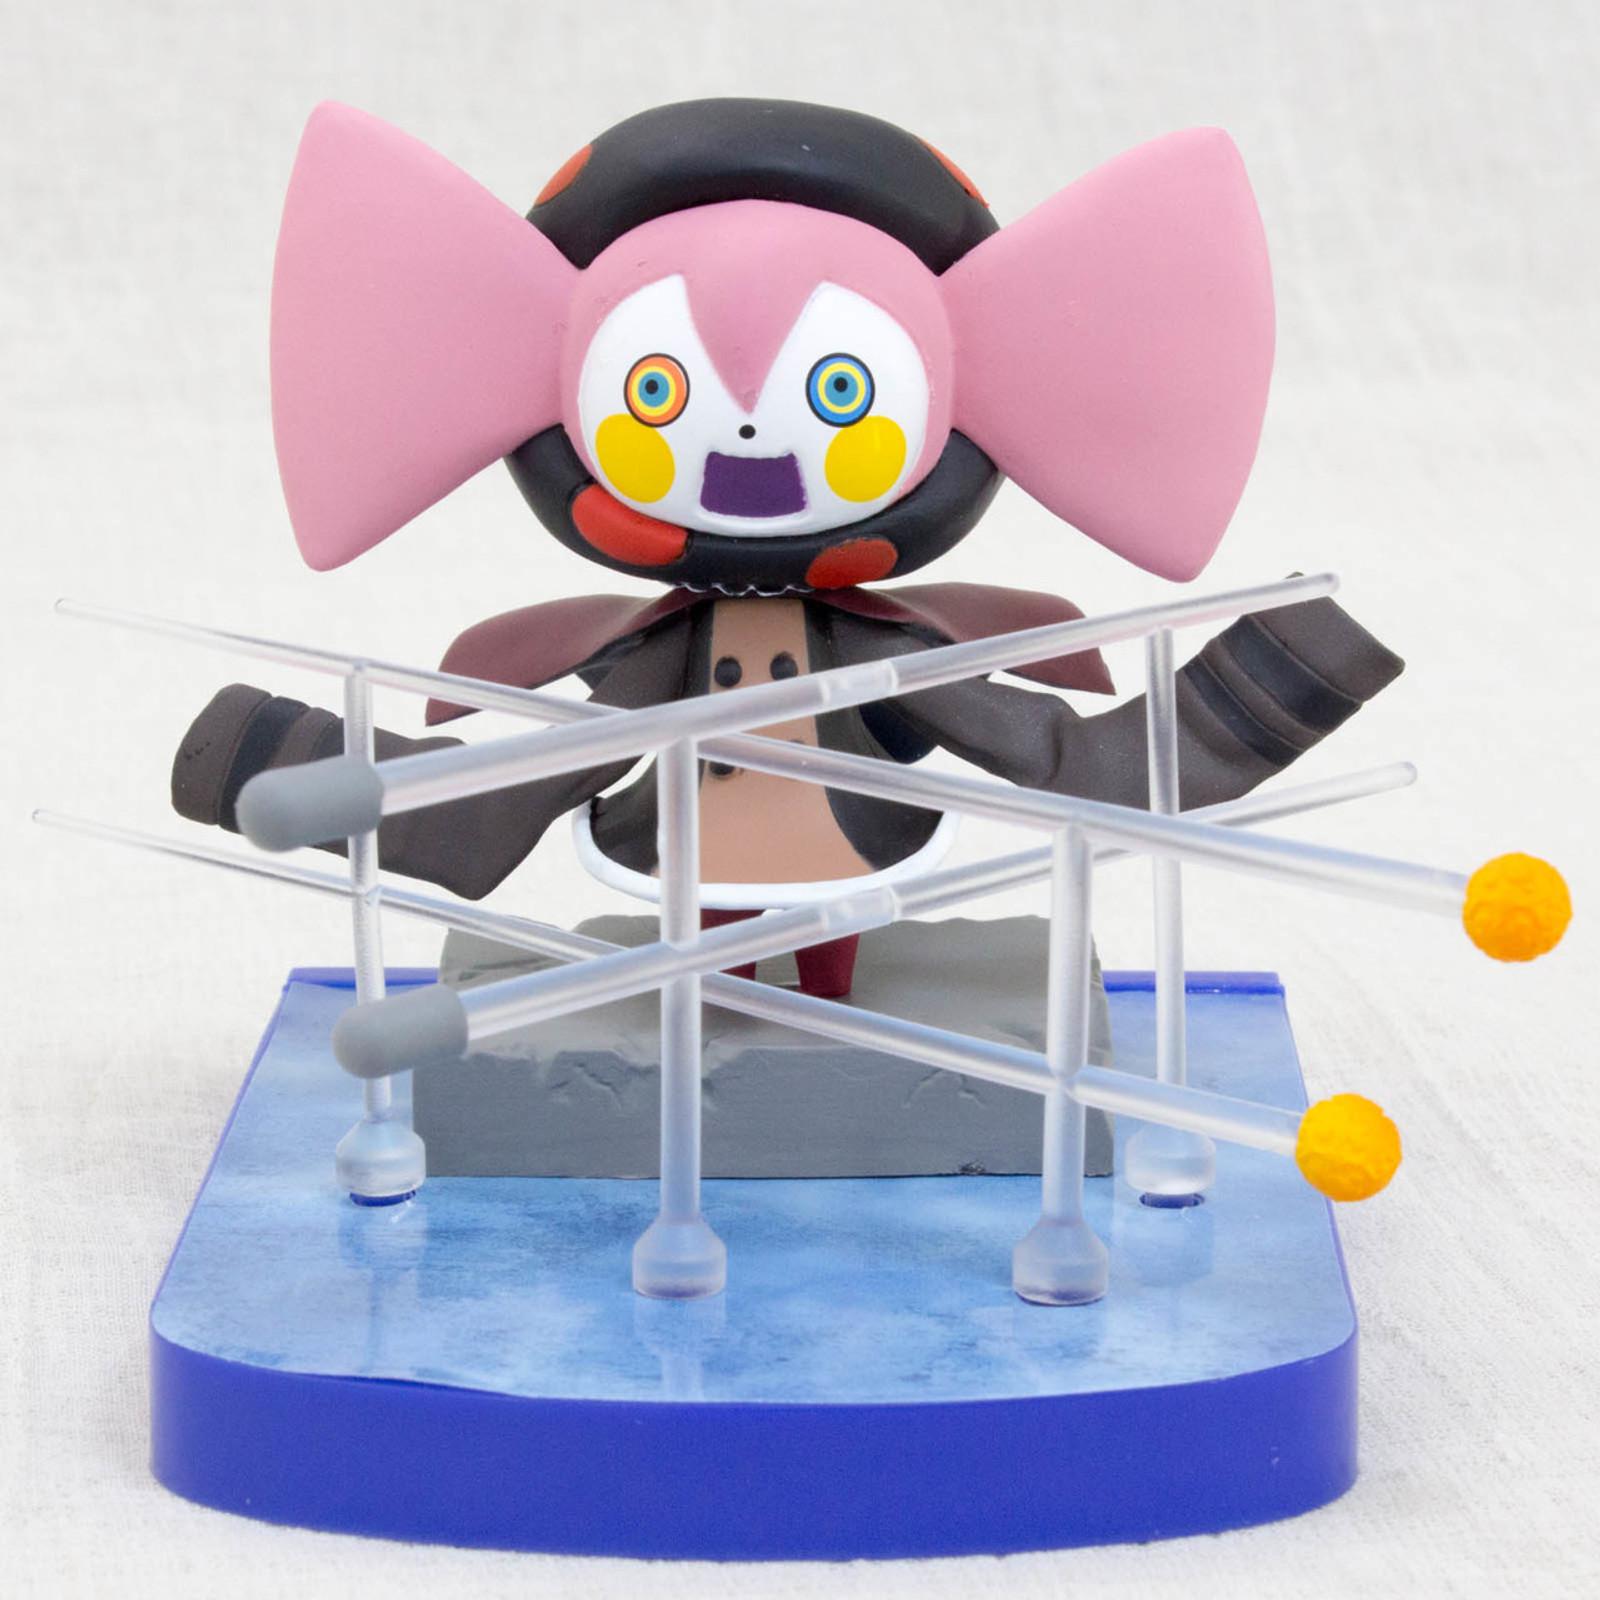 Puella Magi Madoka Magica Sweet Witch Charlotte Bebe Figure SEGA JAPAN ANIME